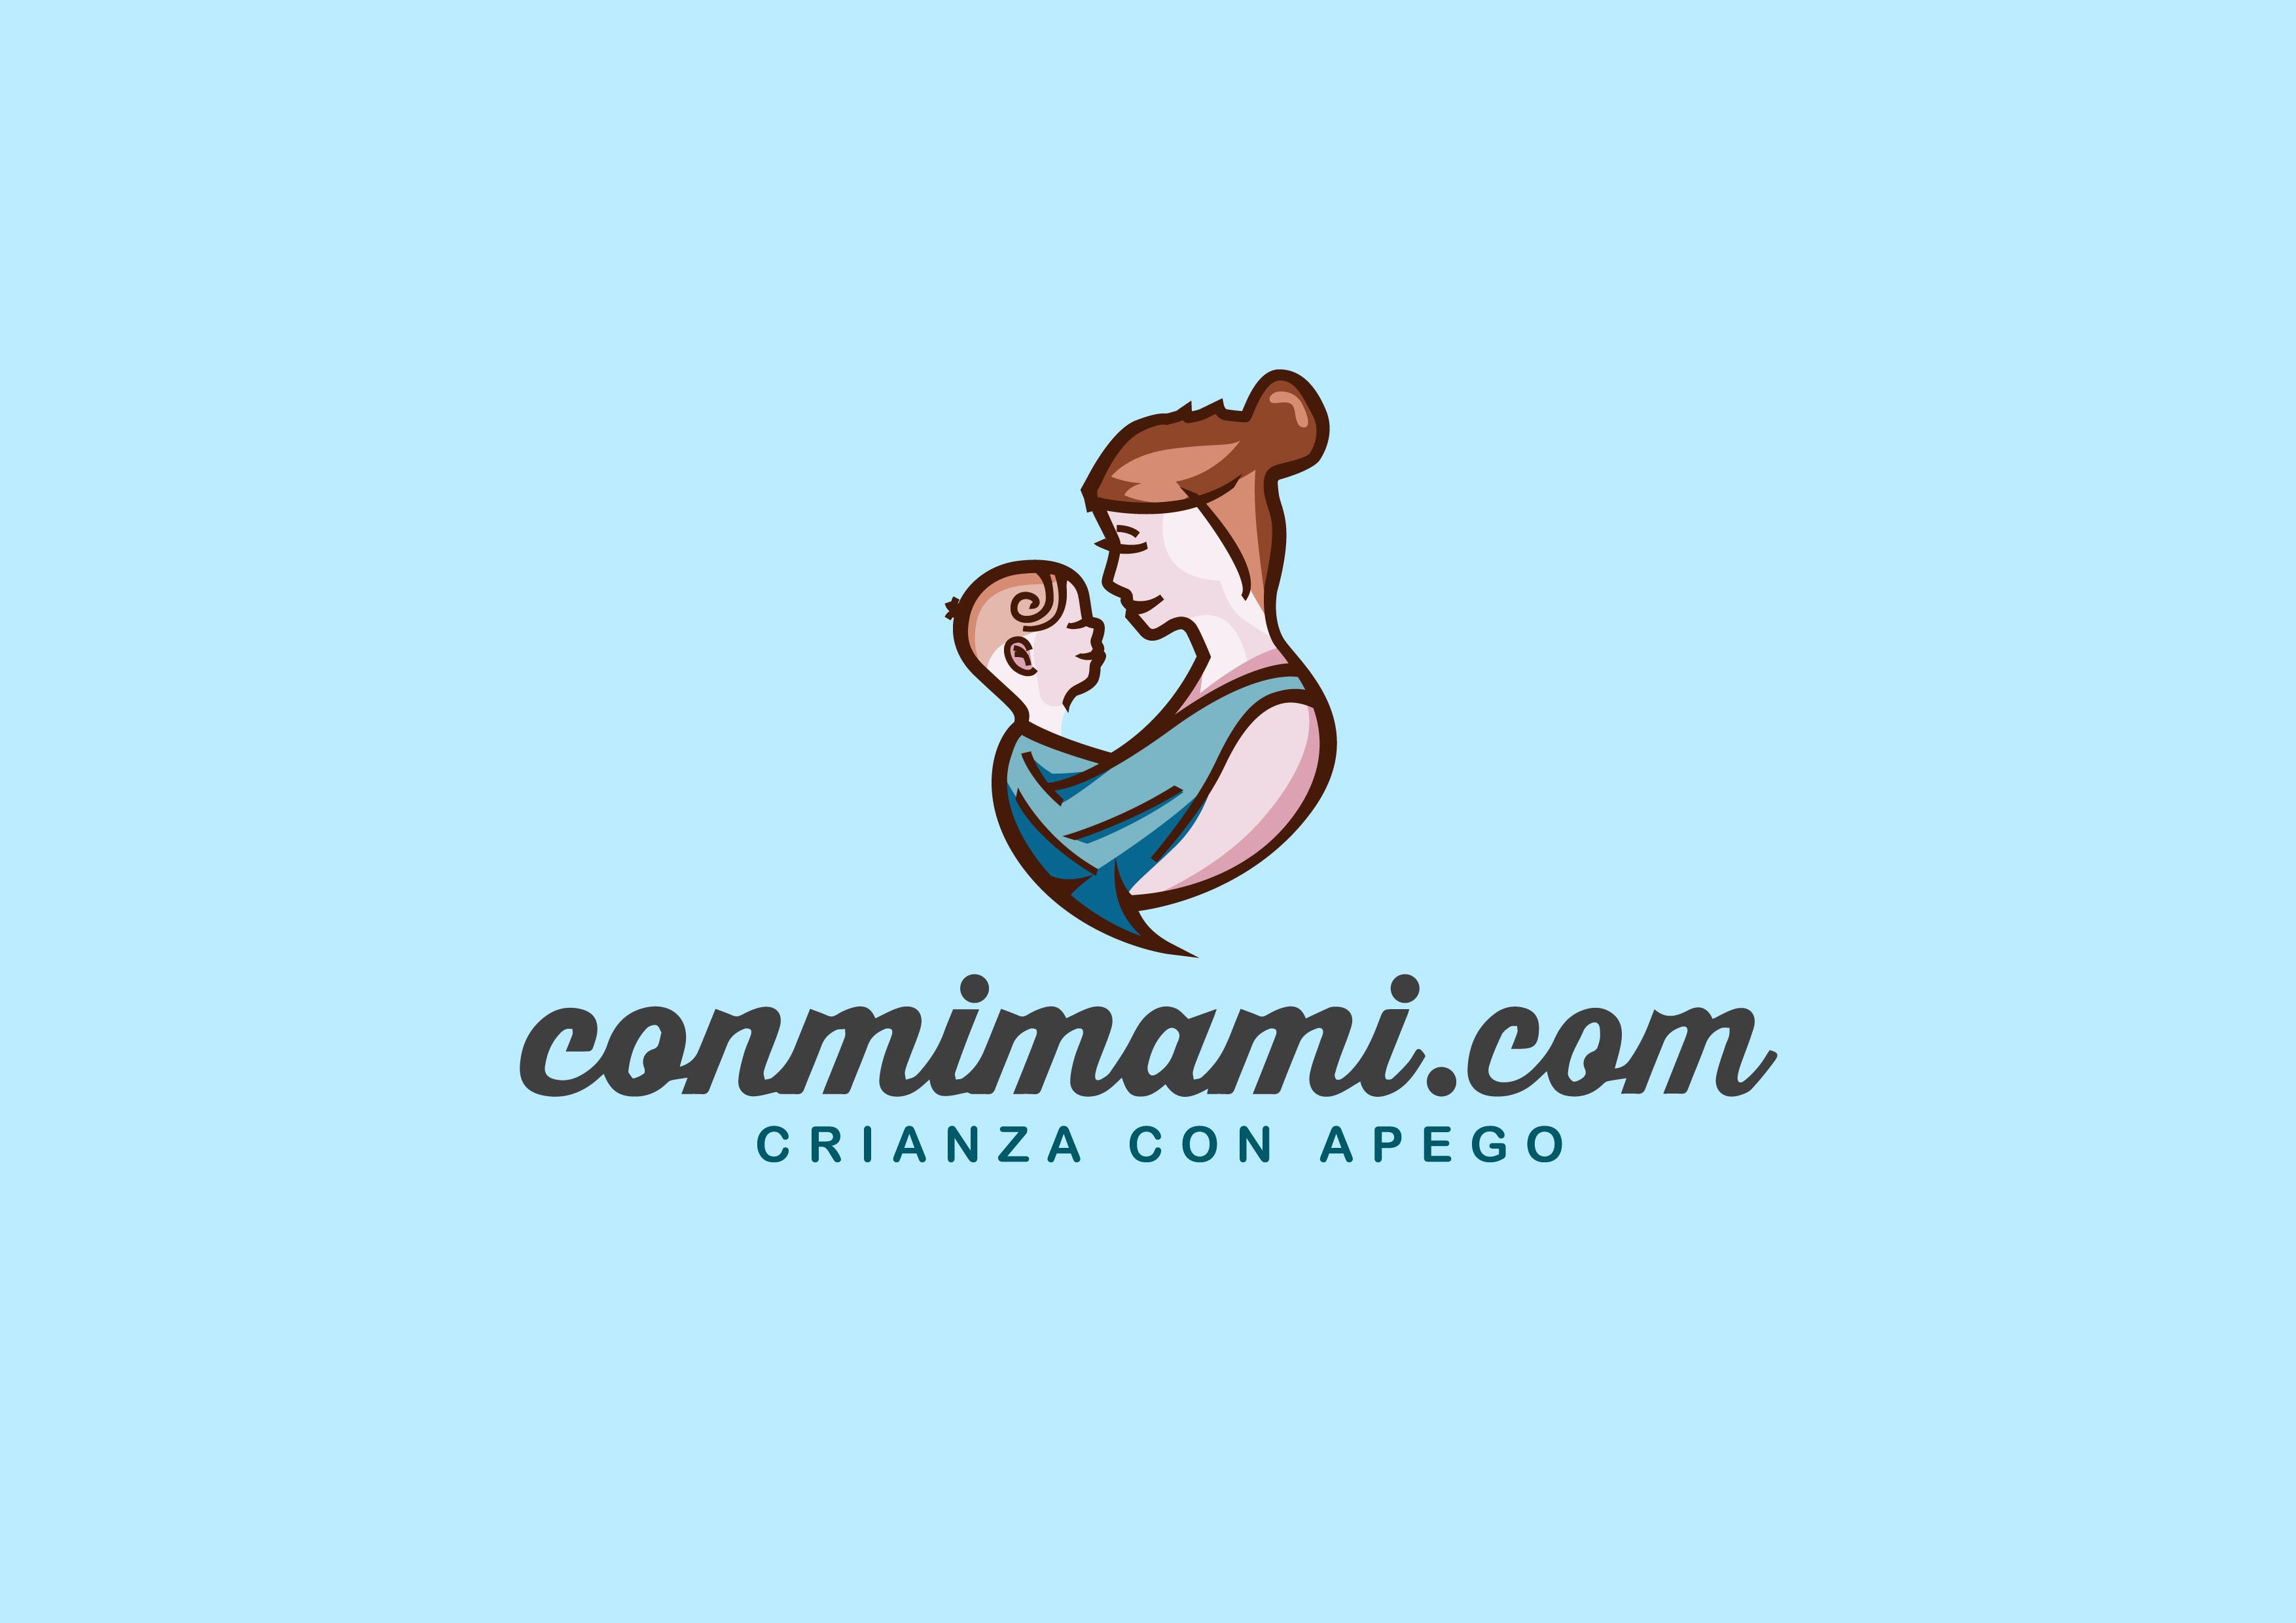 Branding Conmimami